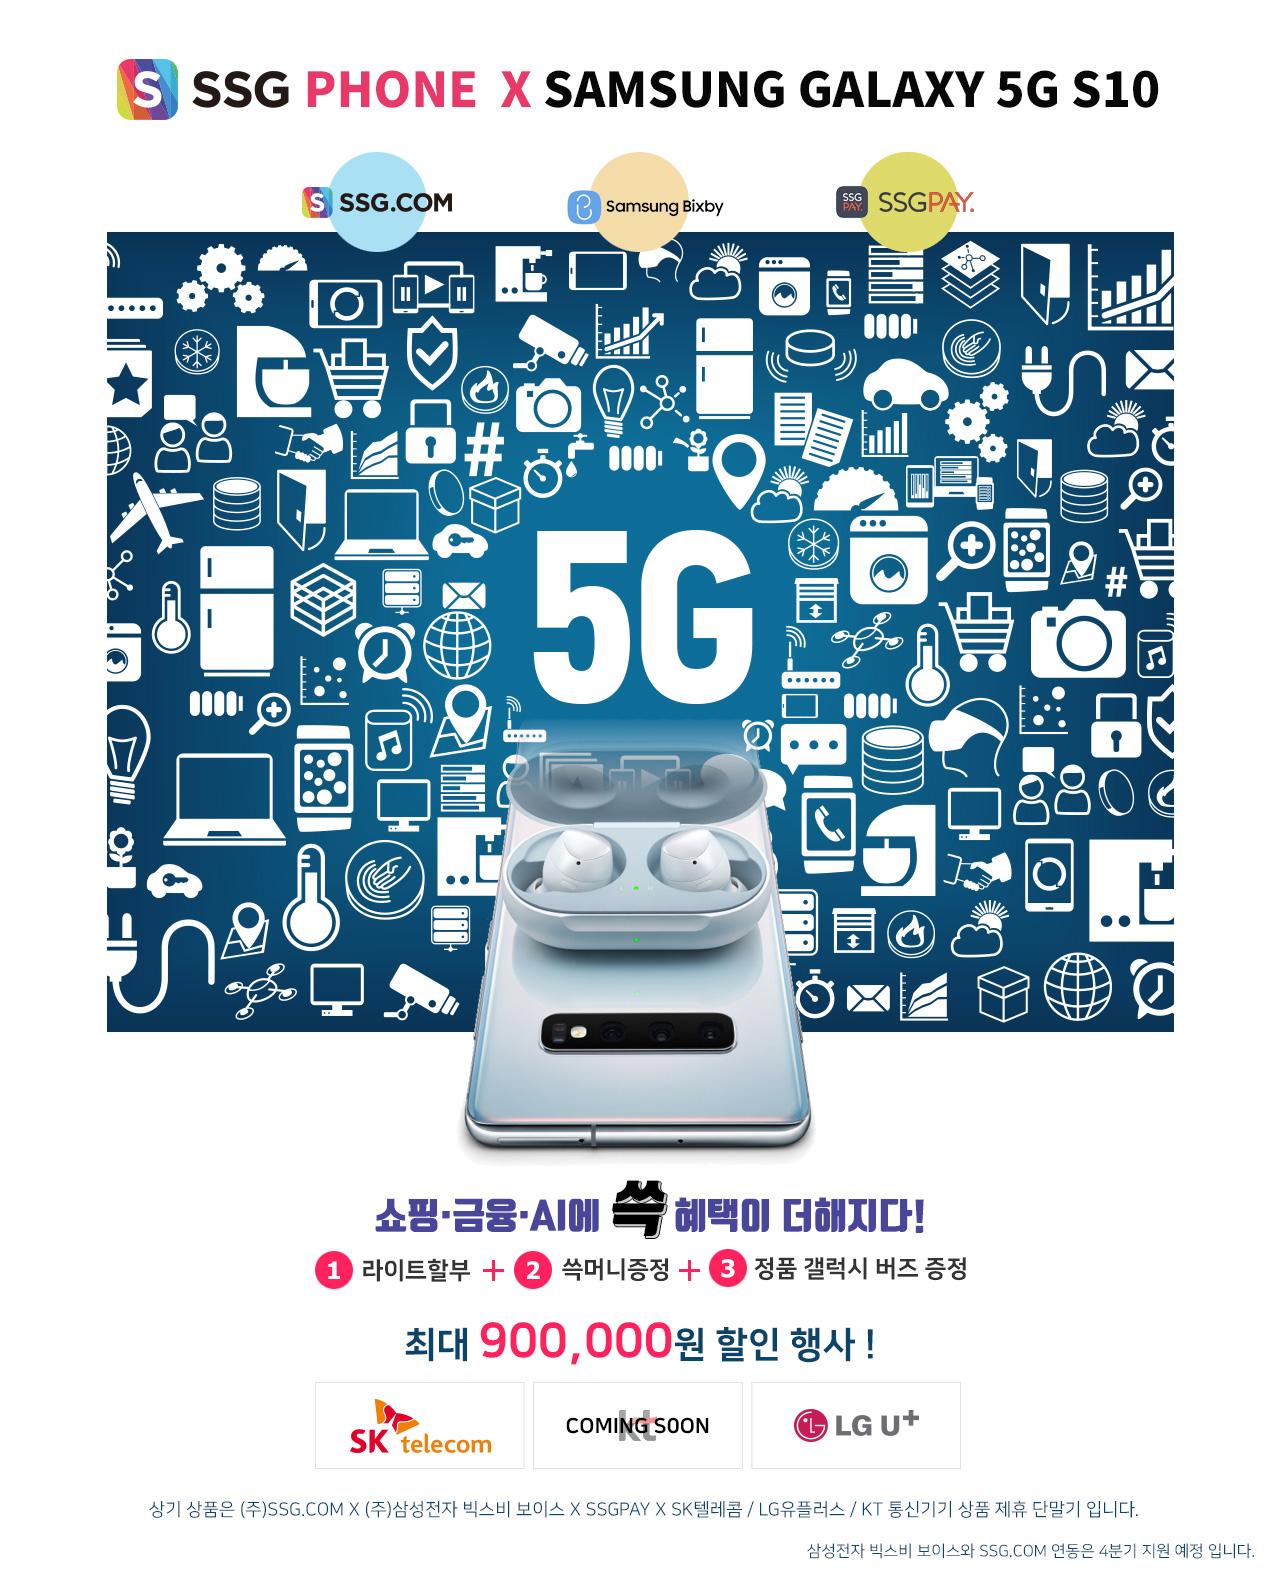 SSG.COM_PHONE 최대85만원 할인 + 갤럭시 버즈 증정